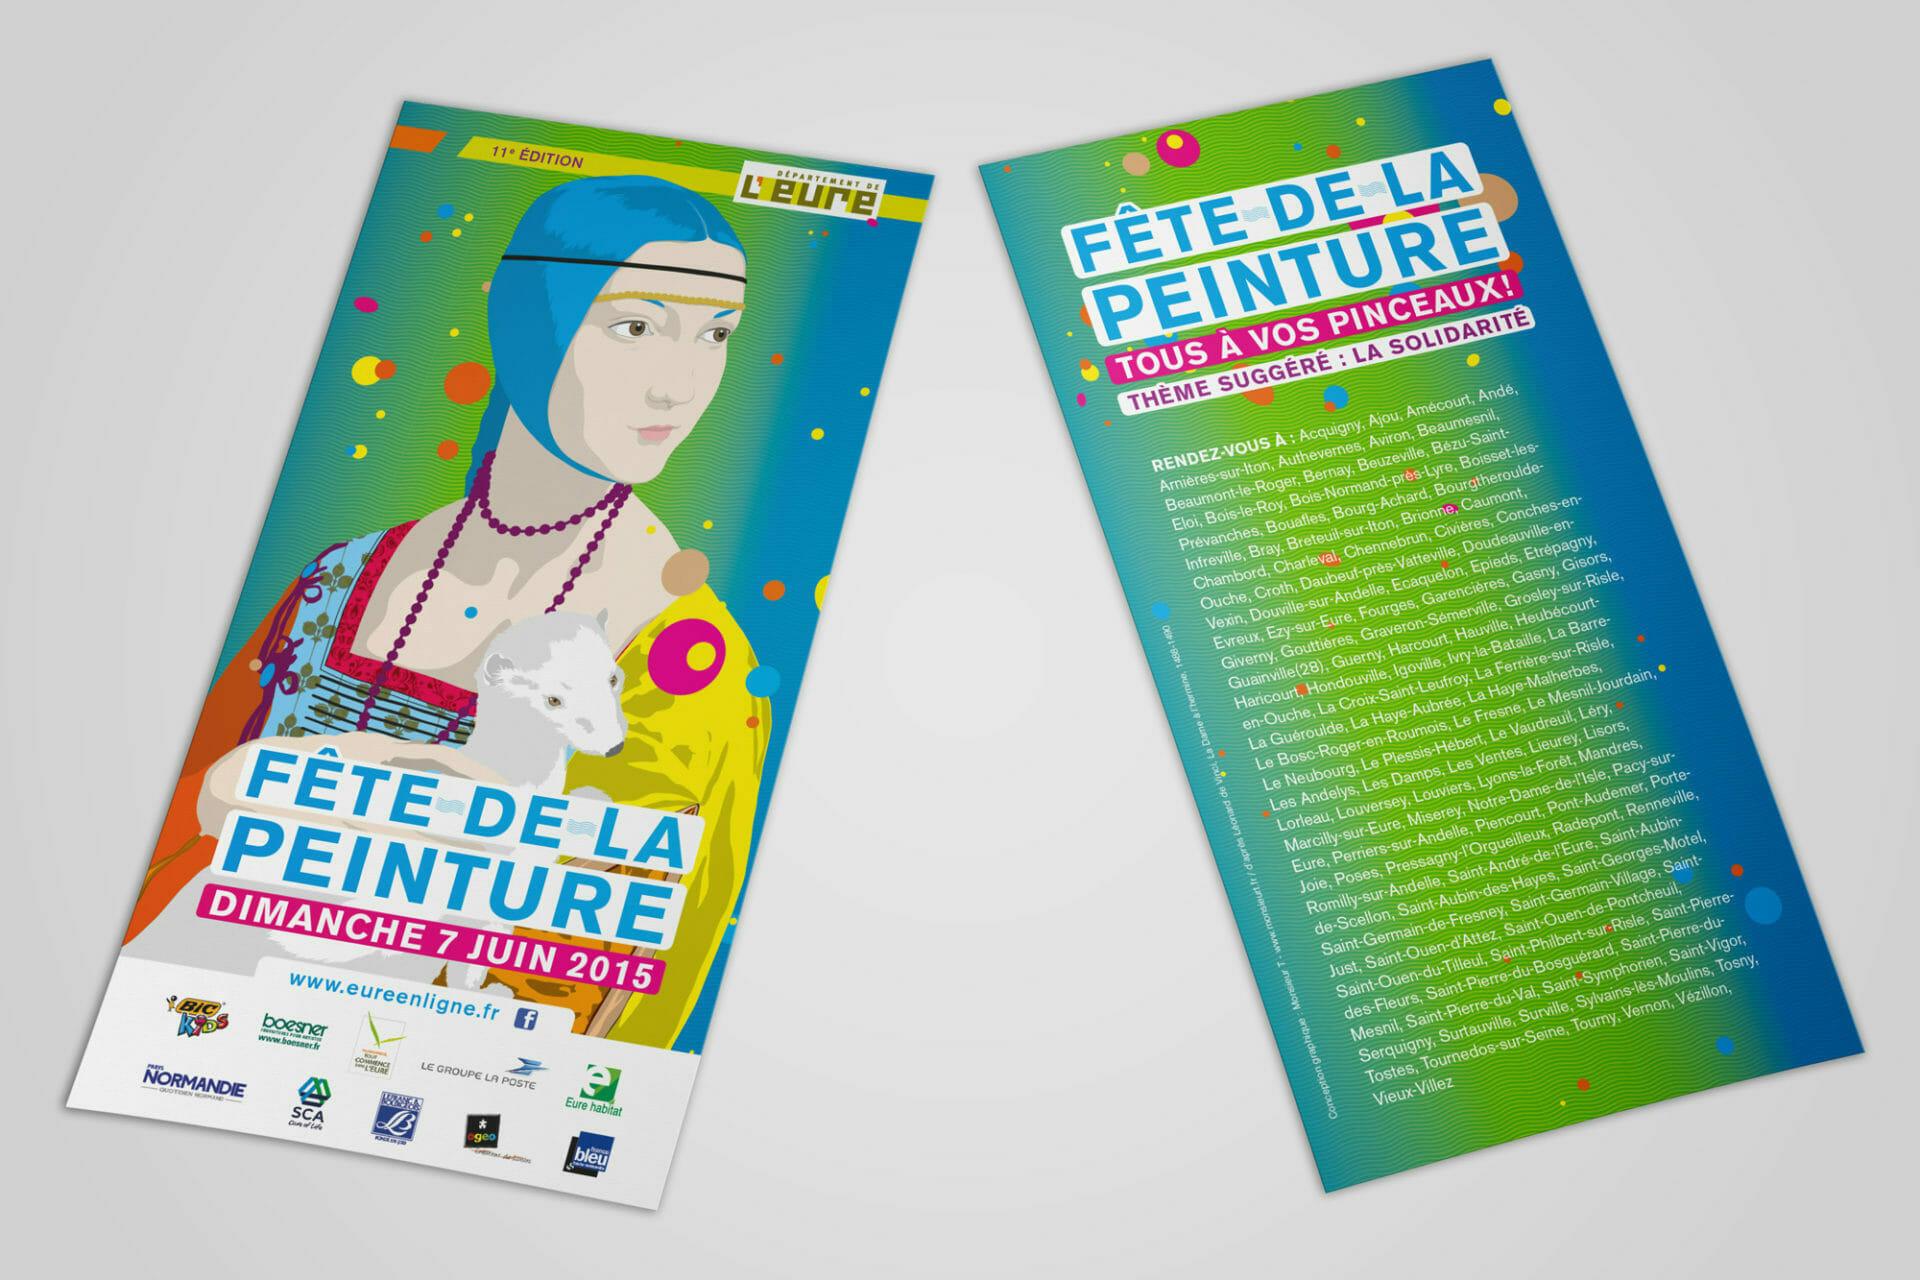 FP2015-flyers-mockup-01